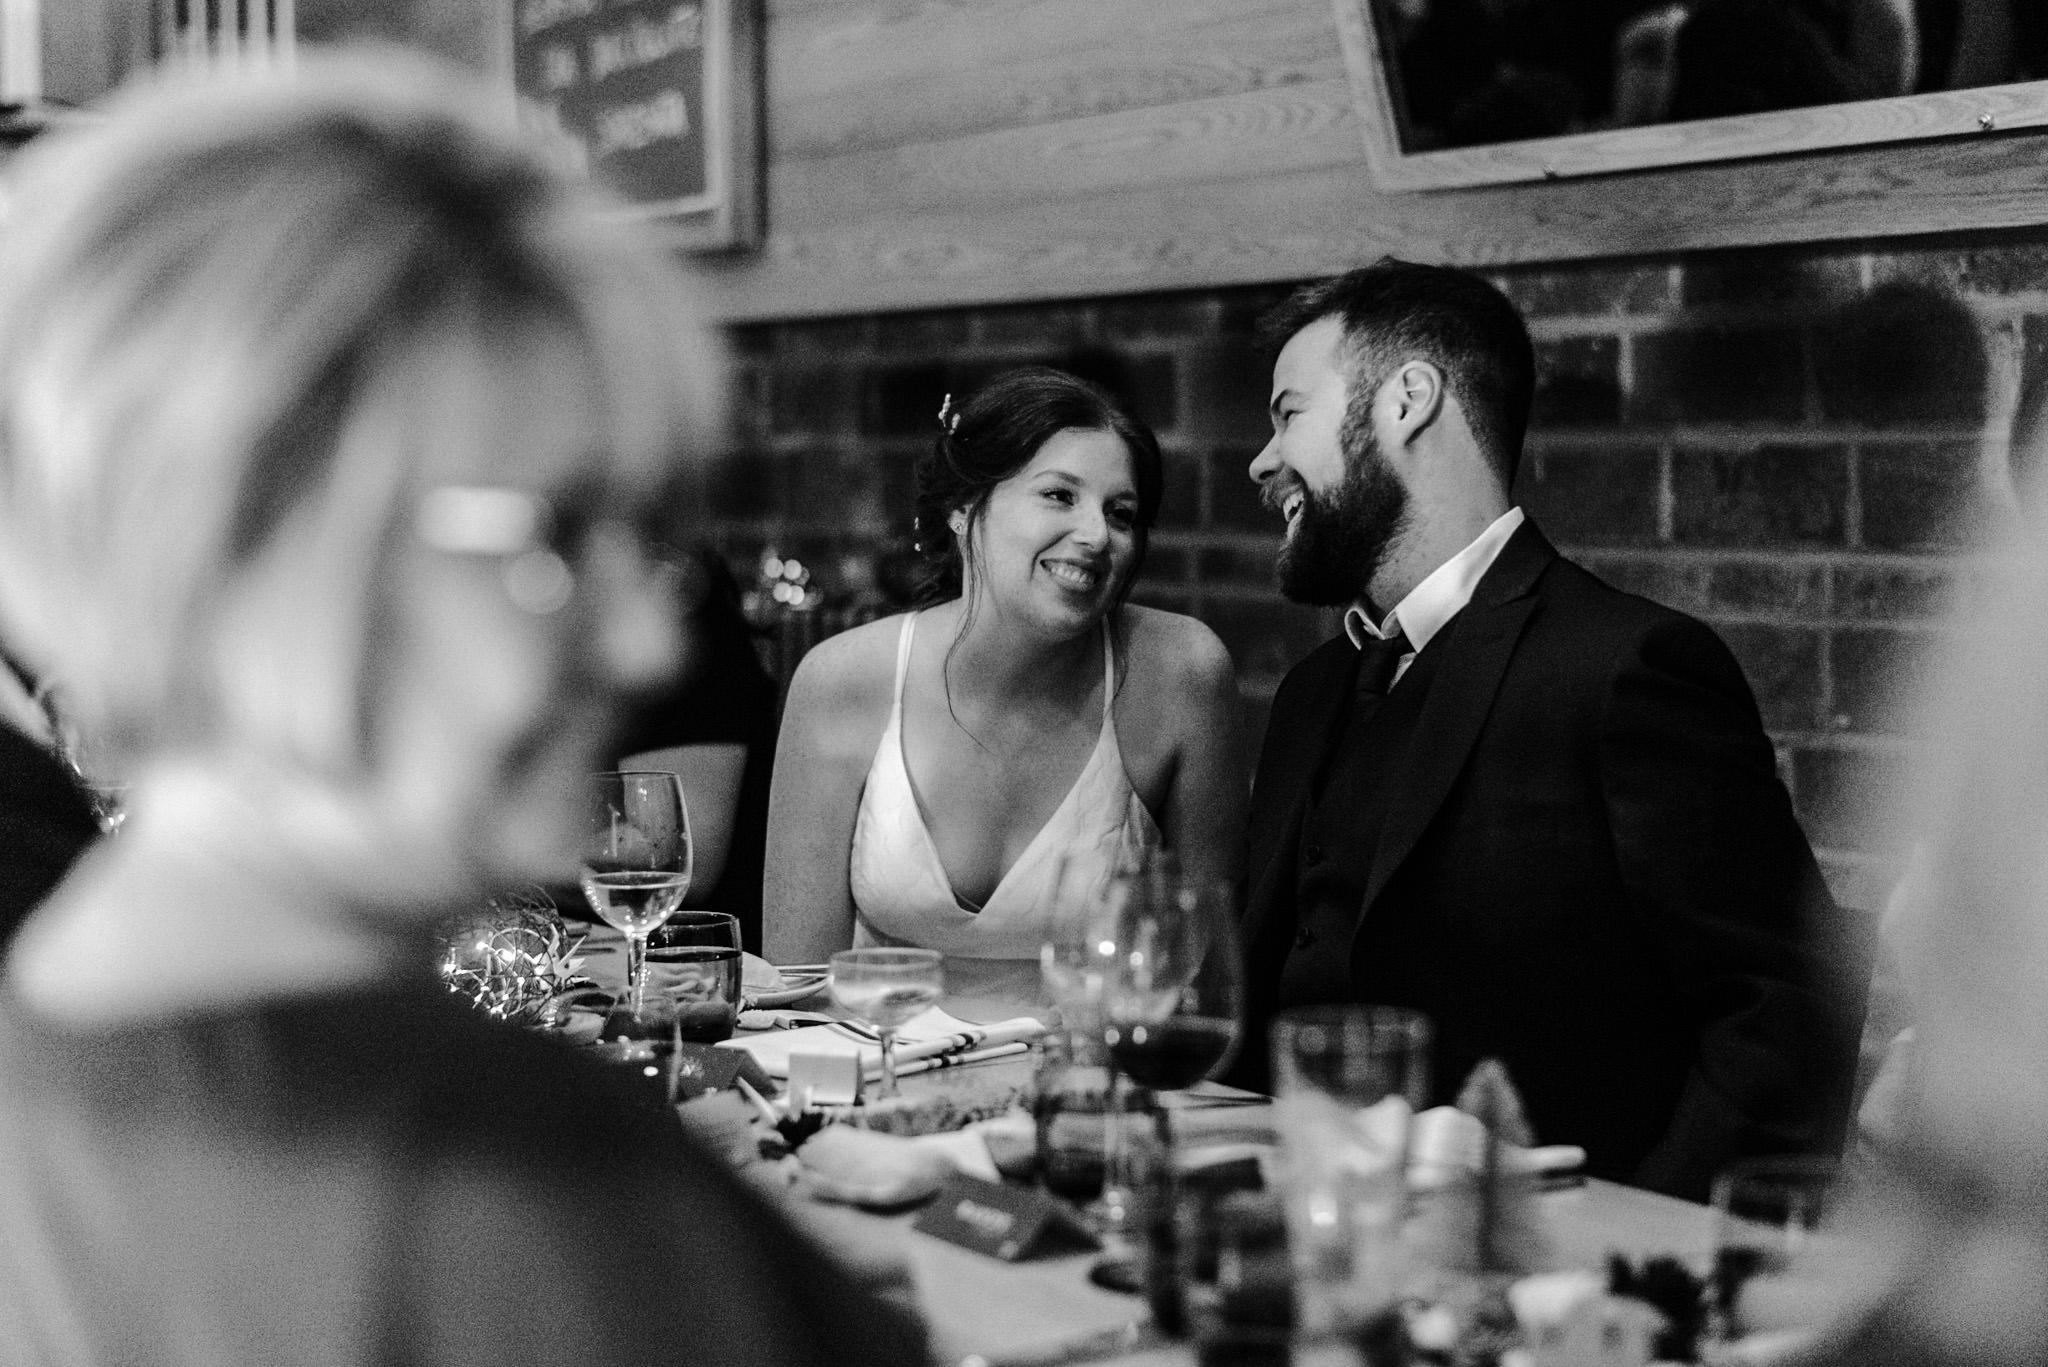 087-intimate-restaurant-wedding-toronto-wedding-photographer.jpg